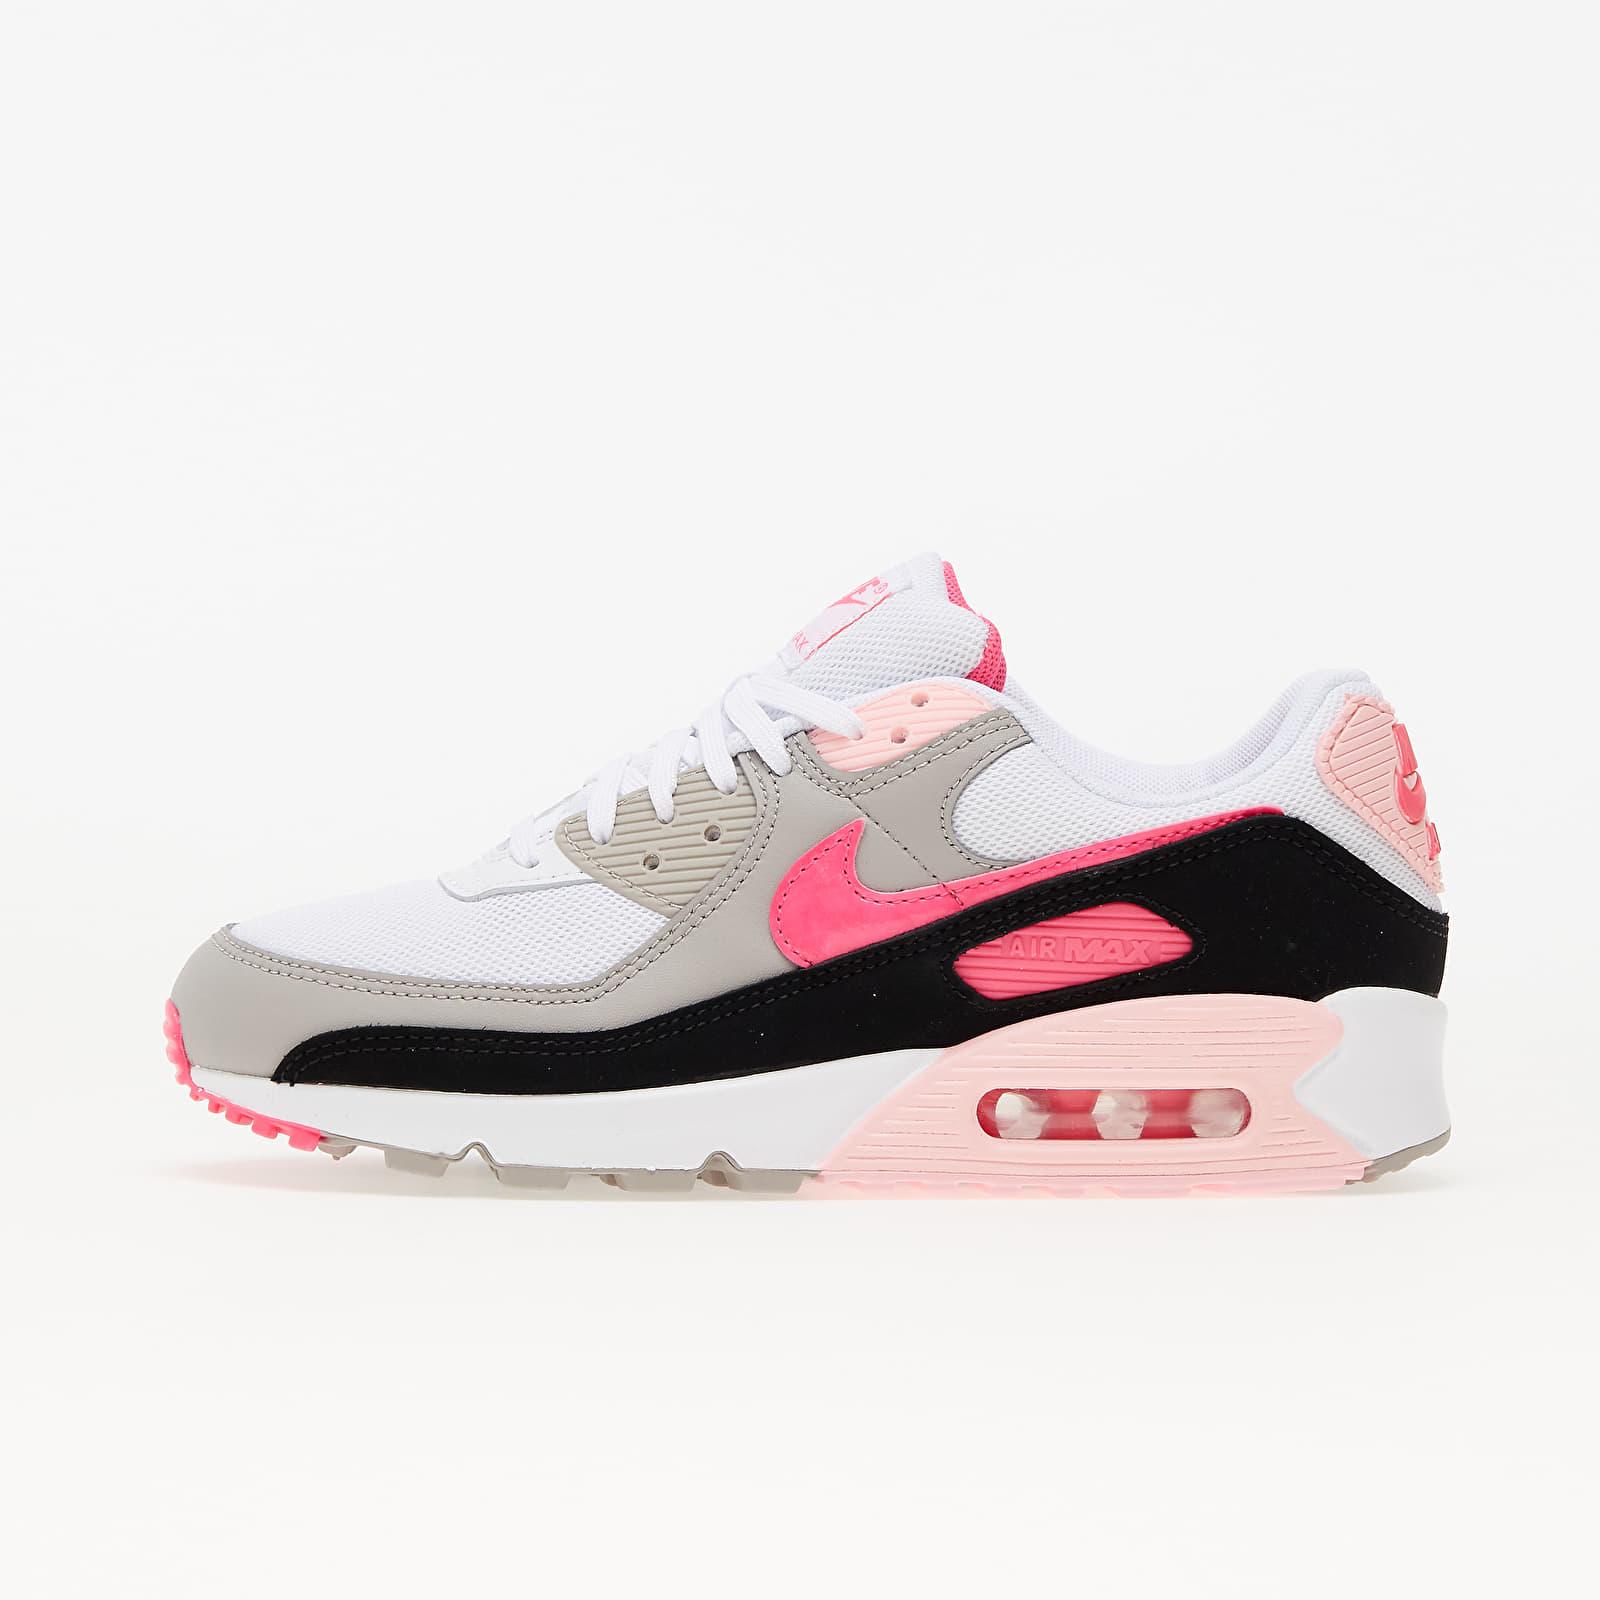 Nike W Air Max 90 White/ Hyper Pink-Black-College Grey EUR 37.5